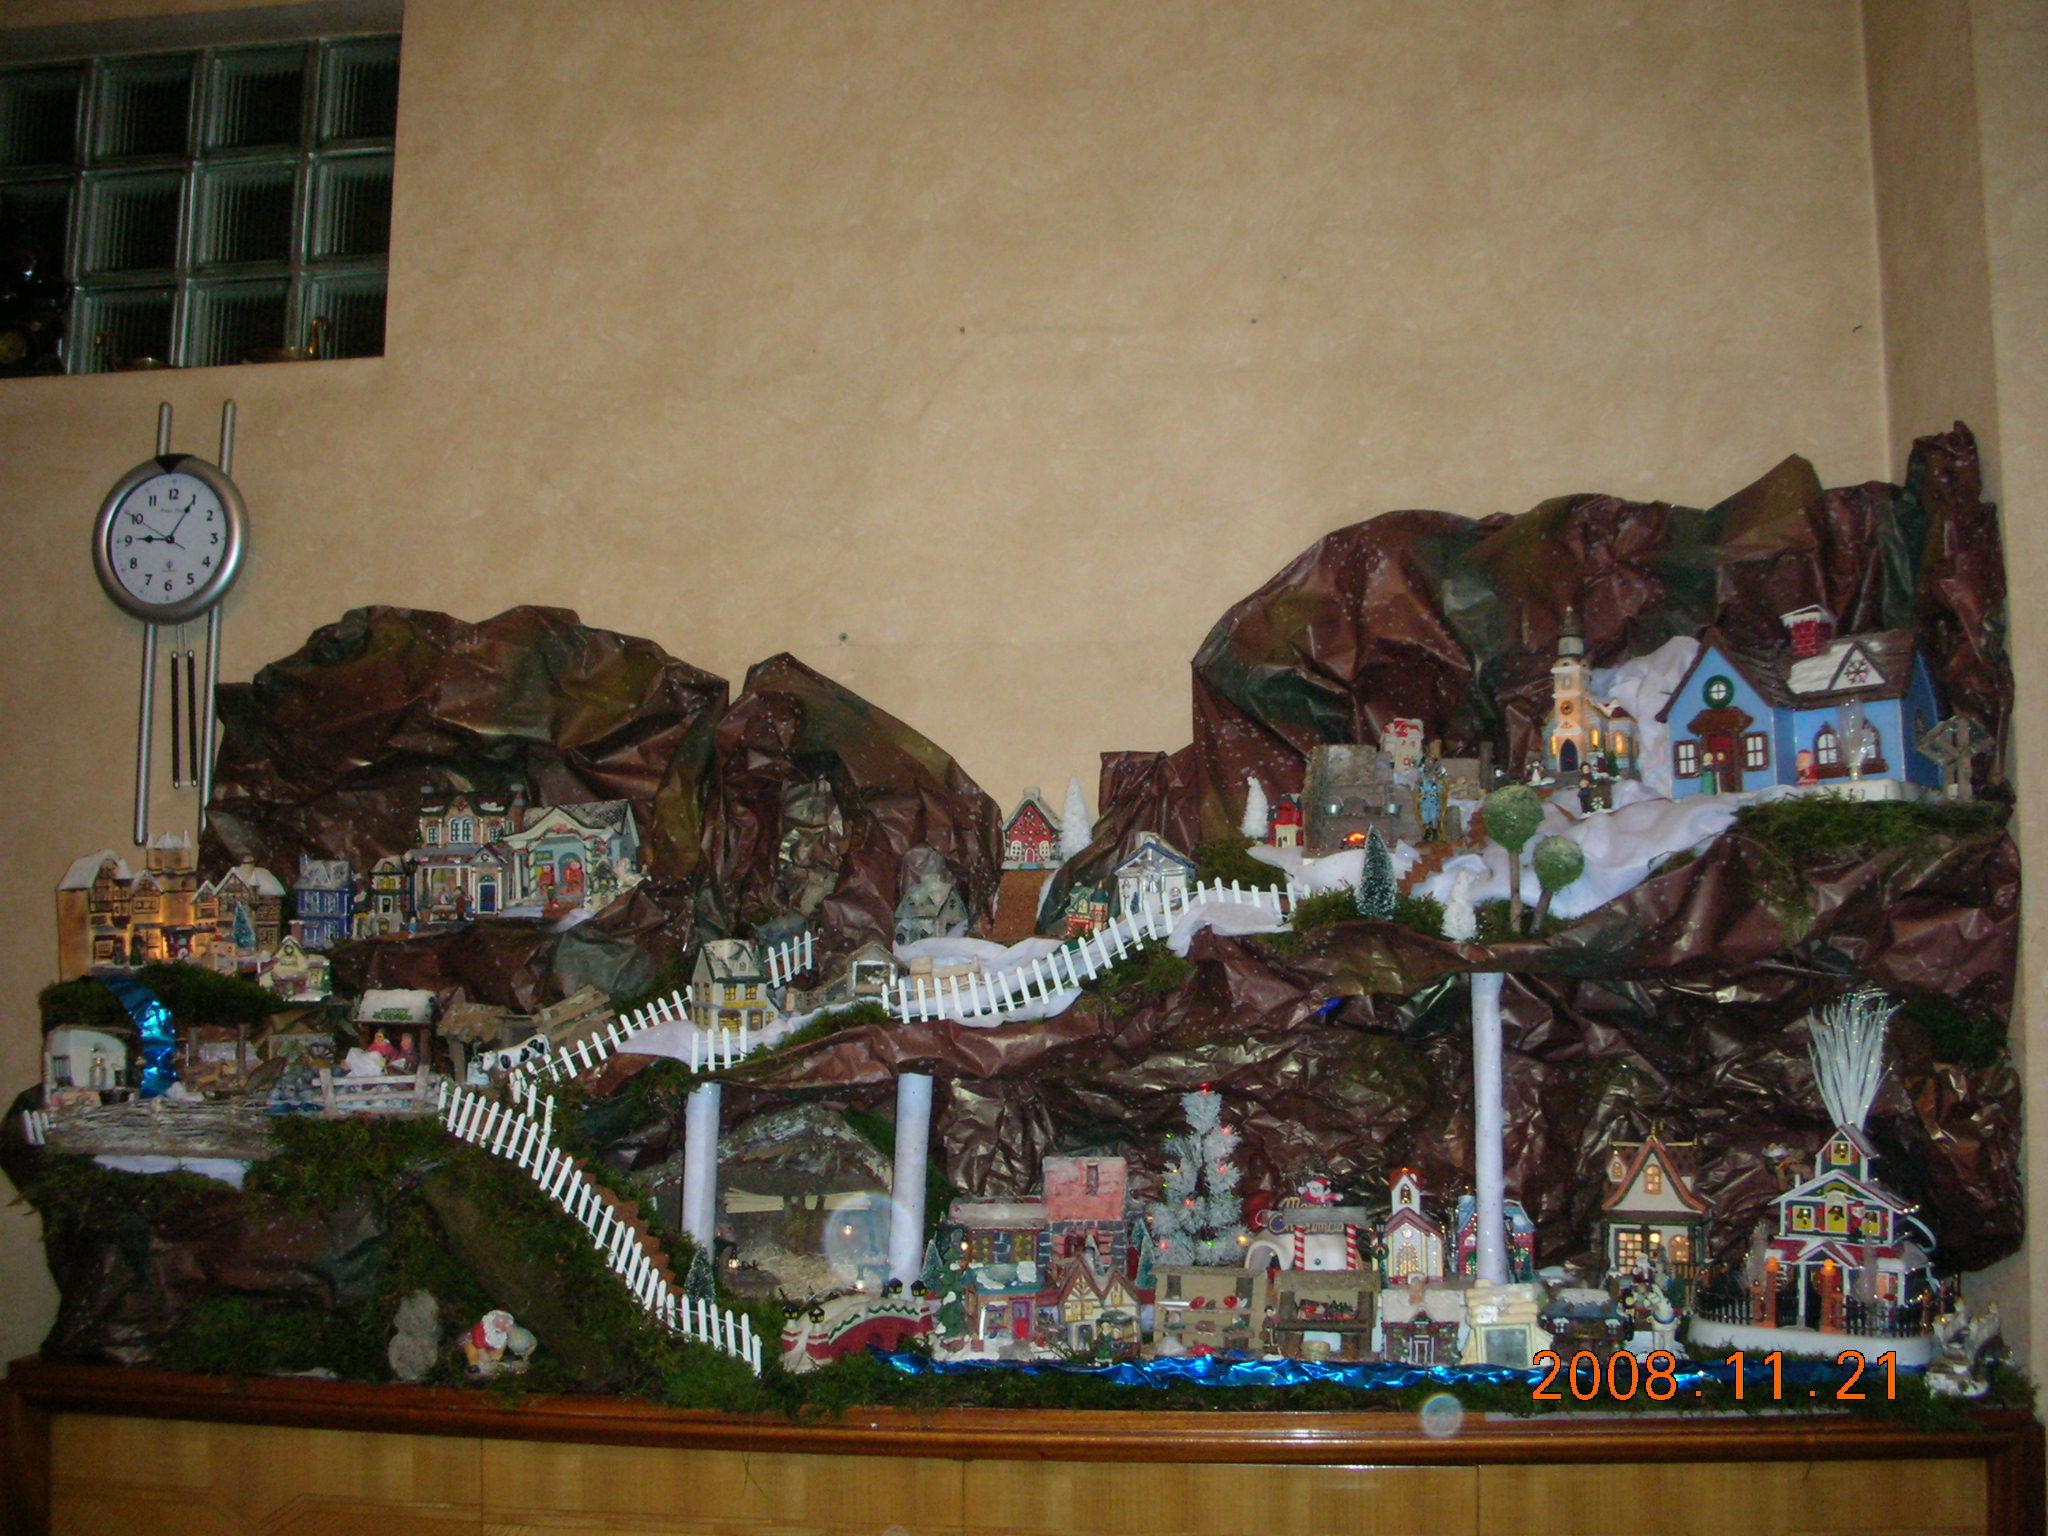 #664628 Décoration Village De Noel Miniature 5463 decorations de noel miniatures 2048x1536 px @ aertt.com